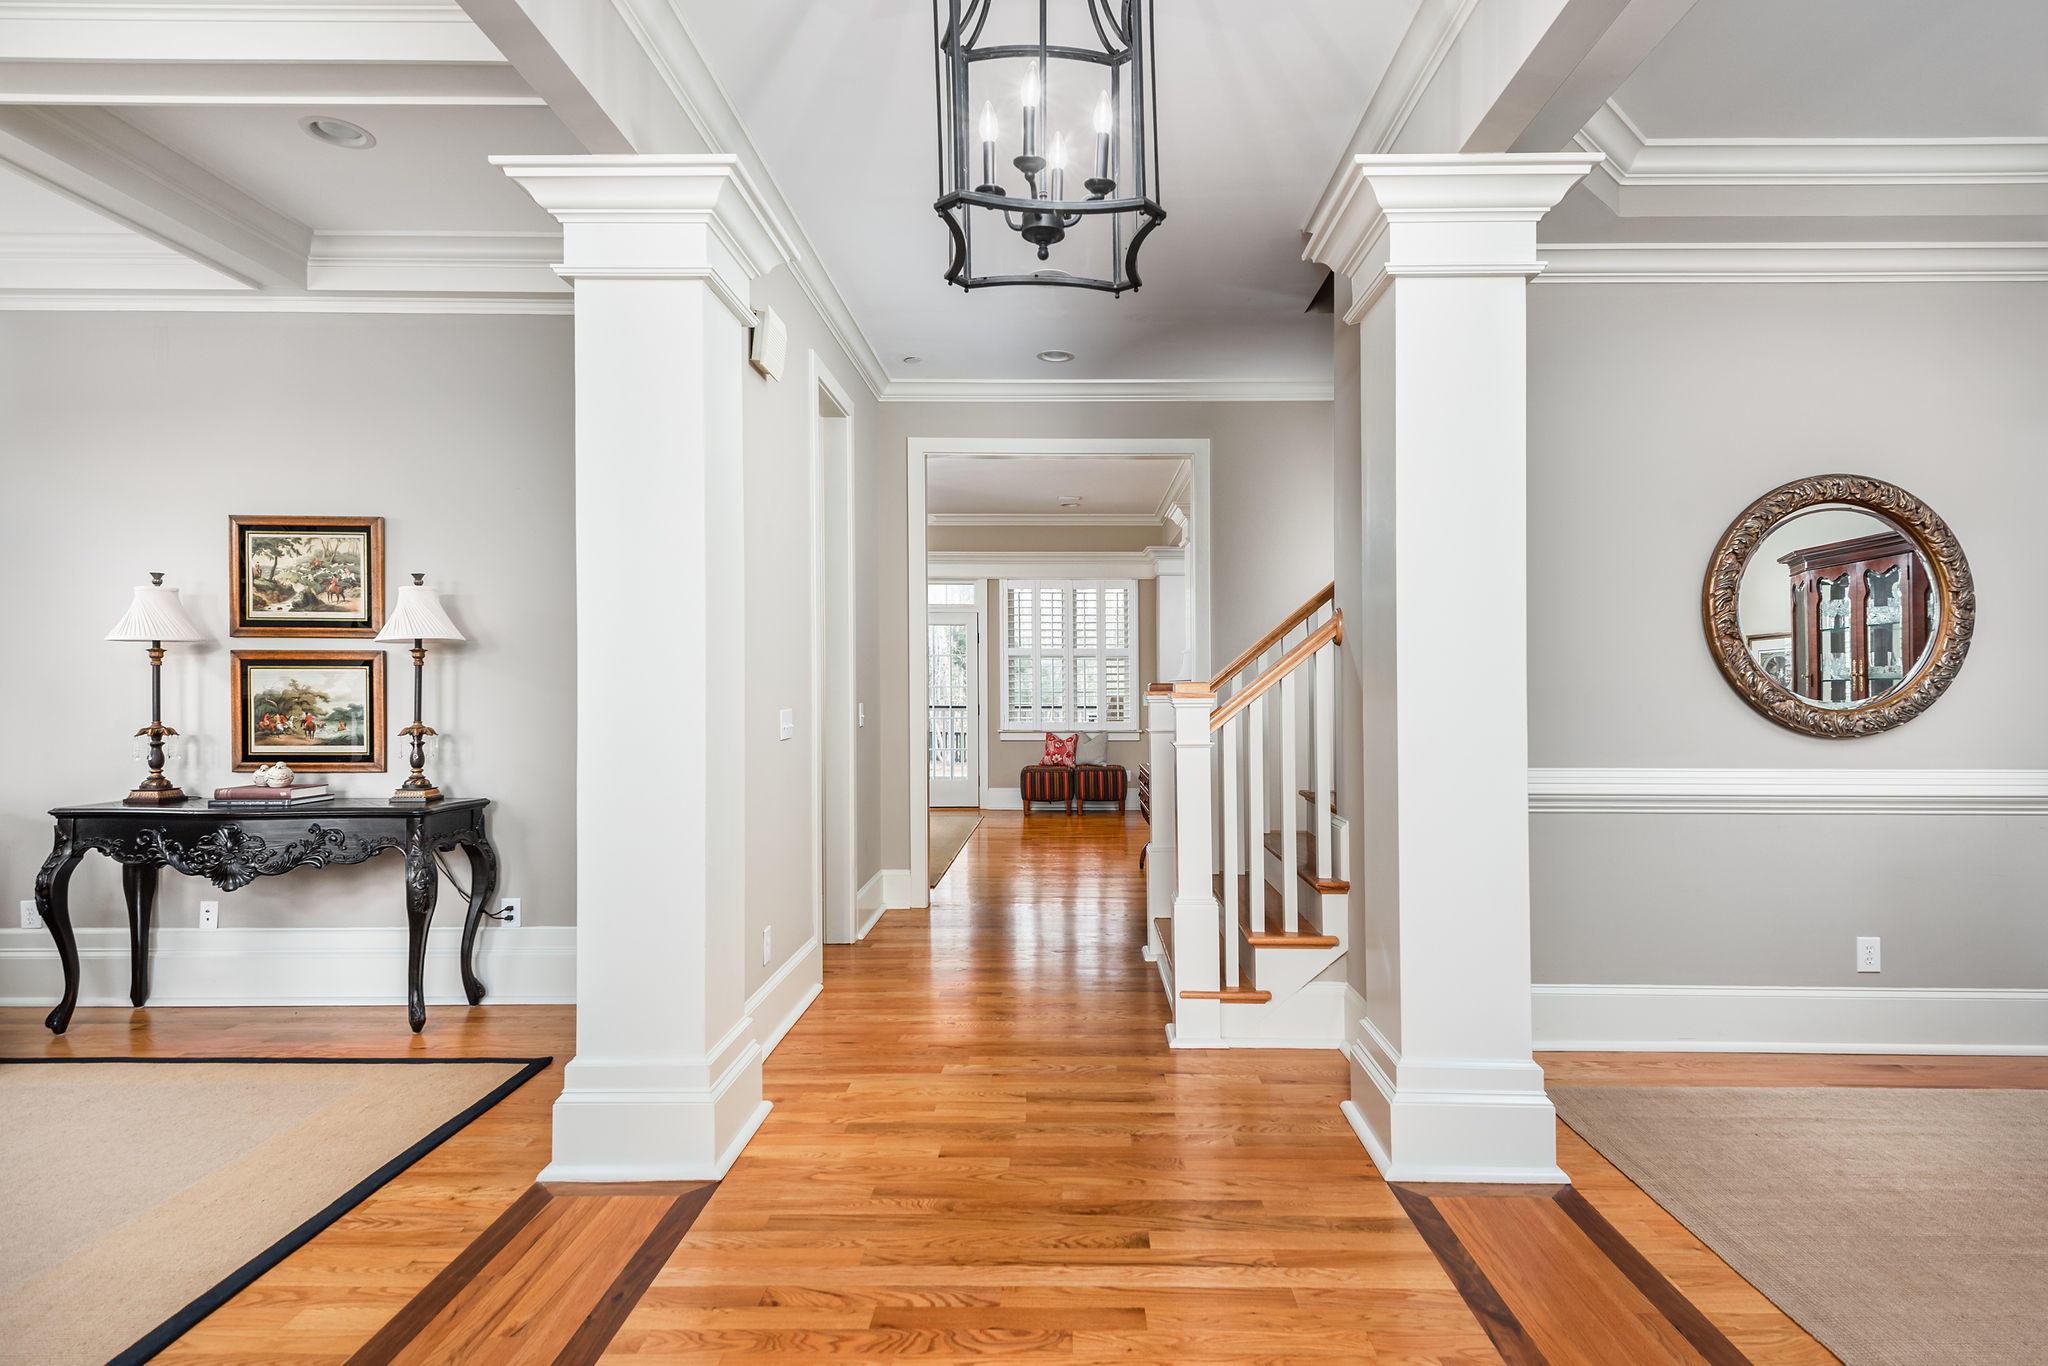 Dunes West Homes For Sale - 1305 King Bird, Mount Pleasant, SC - 42